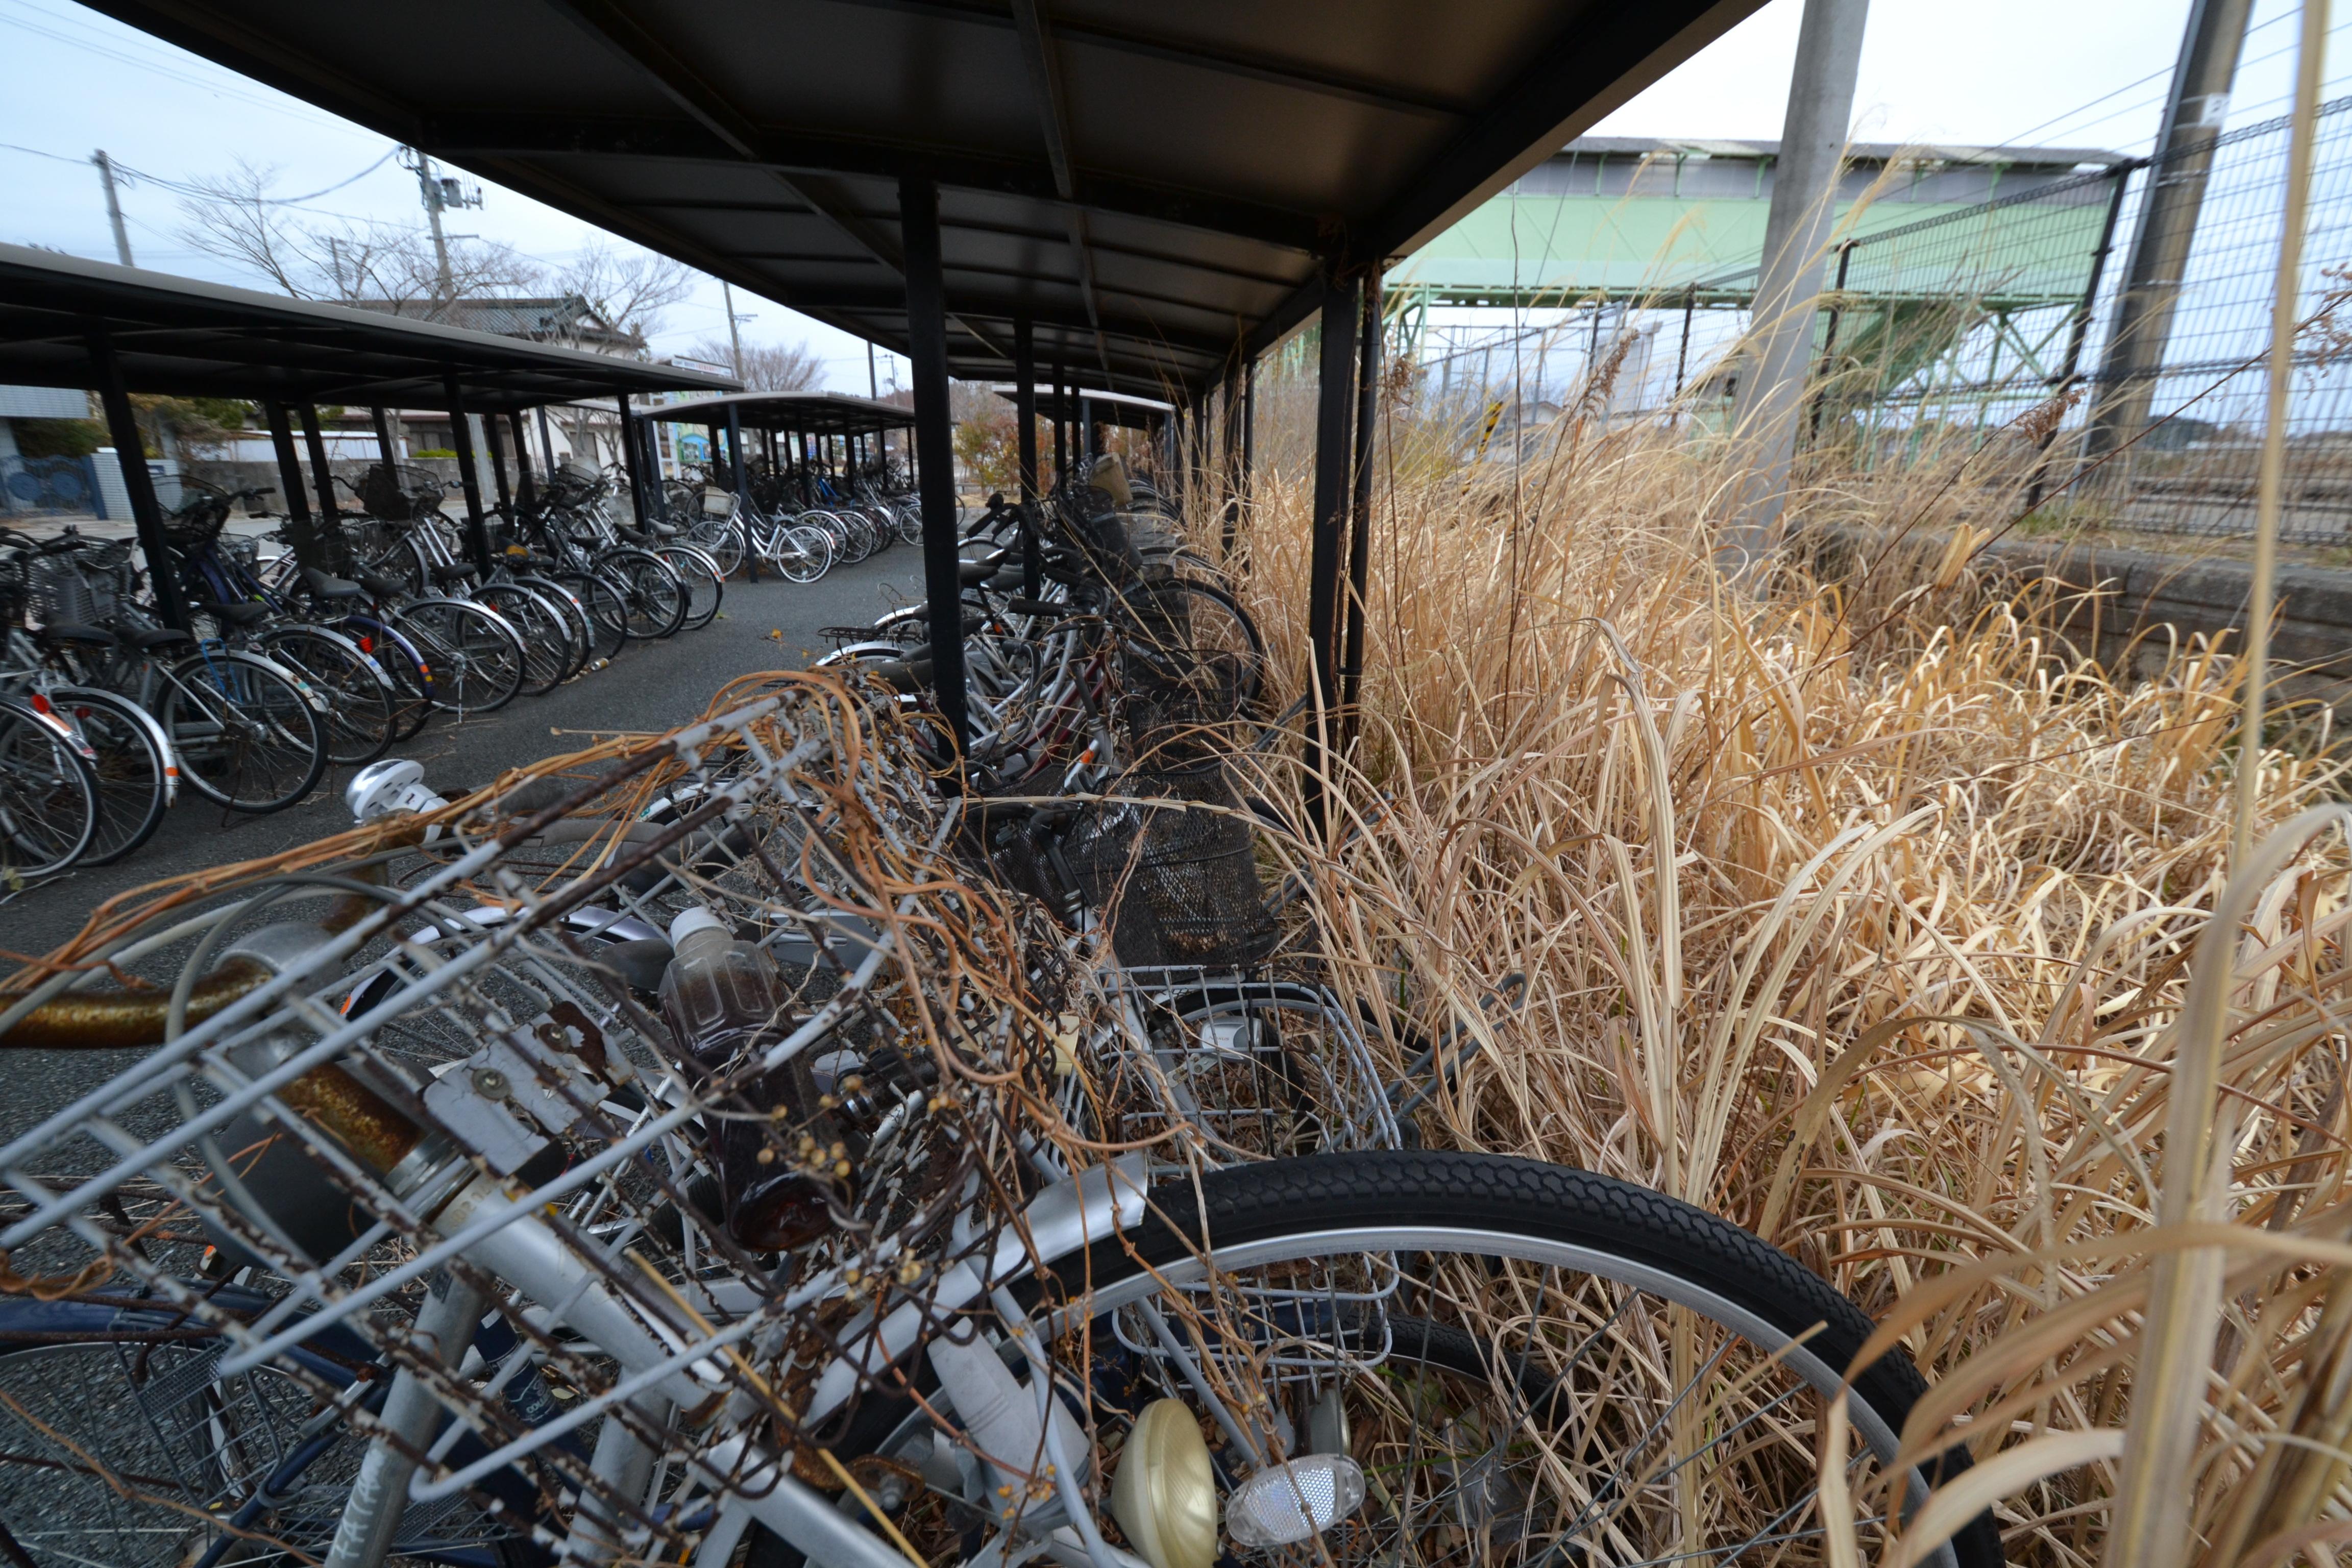 odaka abandoned bikes at train station.JPG